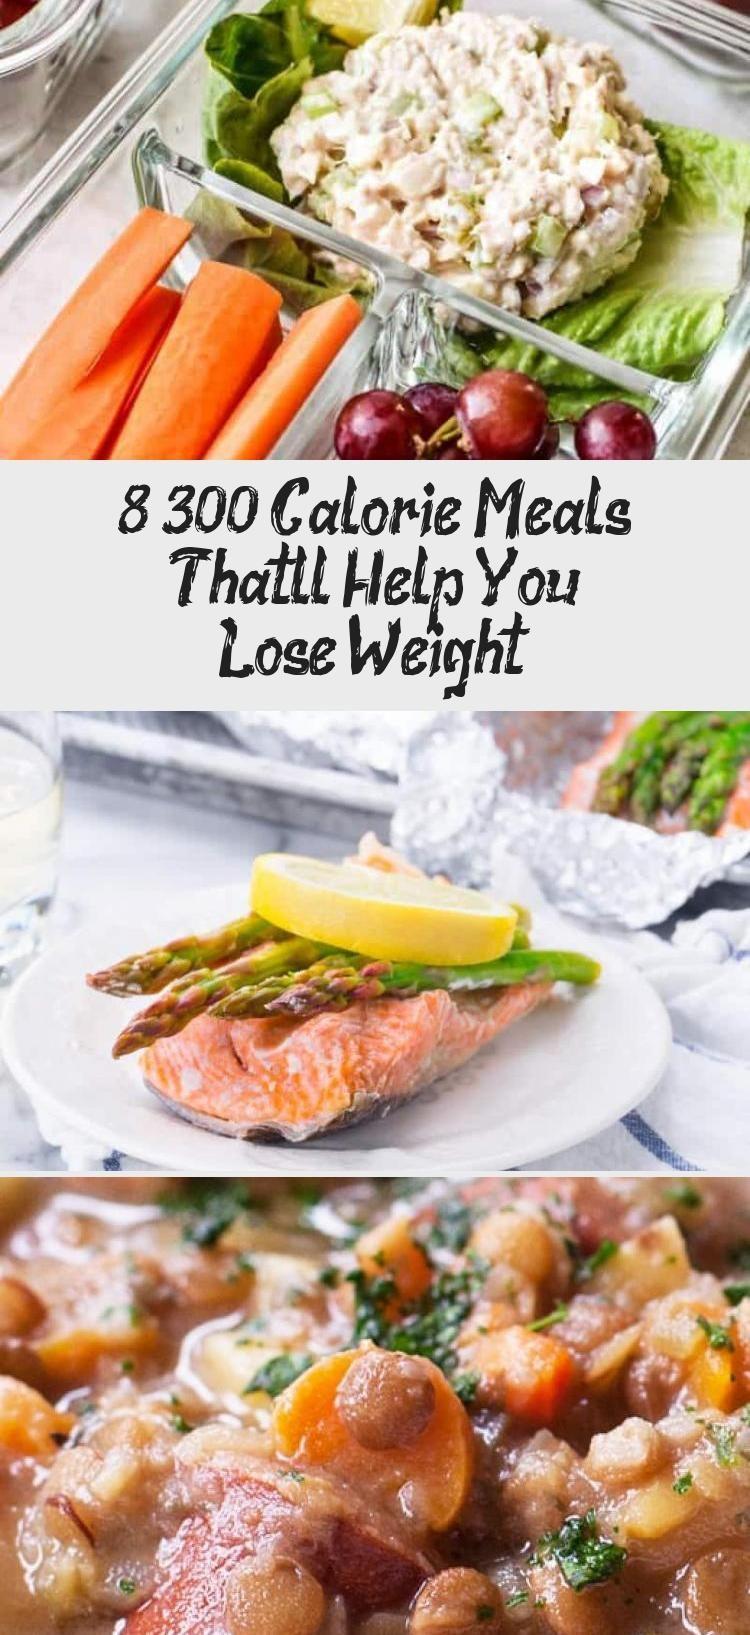 8 300 Calorie Meals That'll Help You Lose Weight - Meraadi #FoodandDrinkLunch #300caloriemeals 8 300 Calorie Meals That'll Help You Lose Weight - Meraadi #FoodandDrinkLunch #300caloriemeals